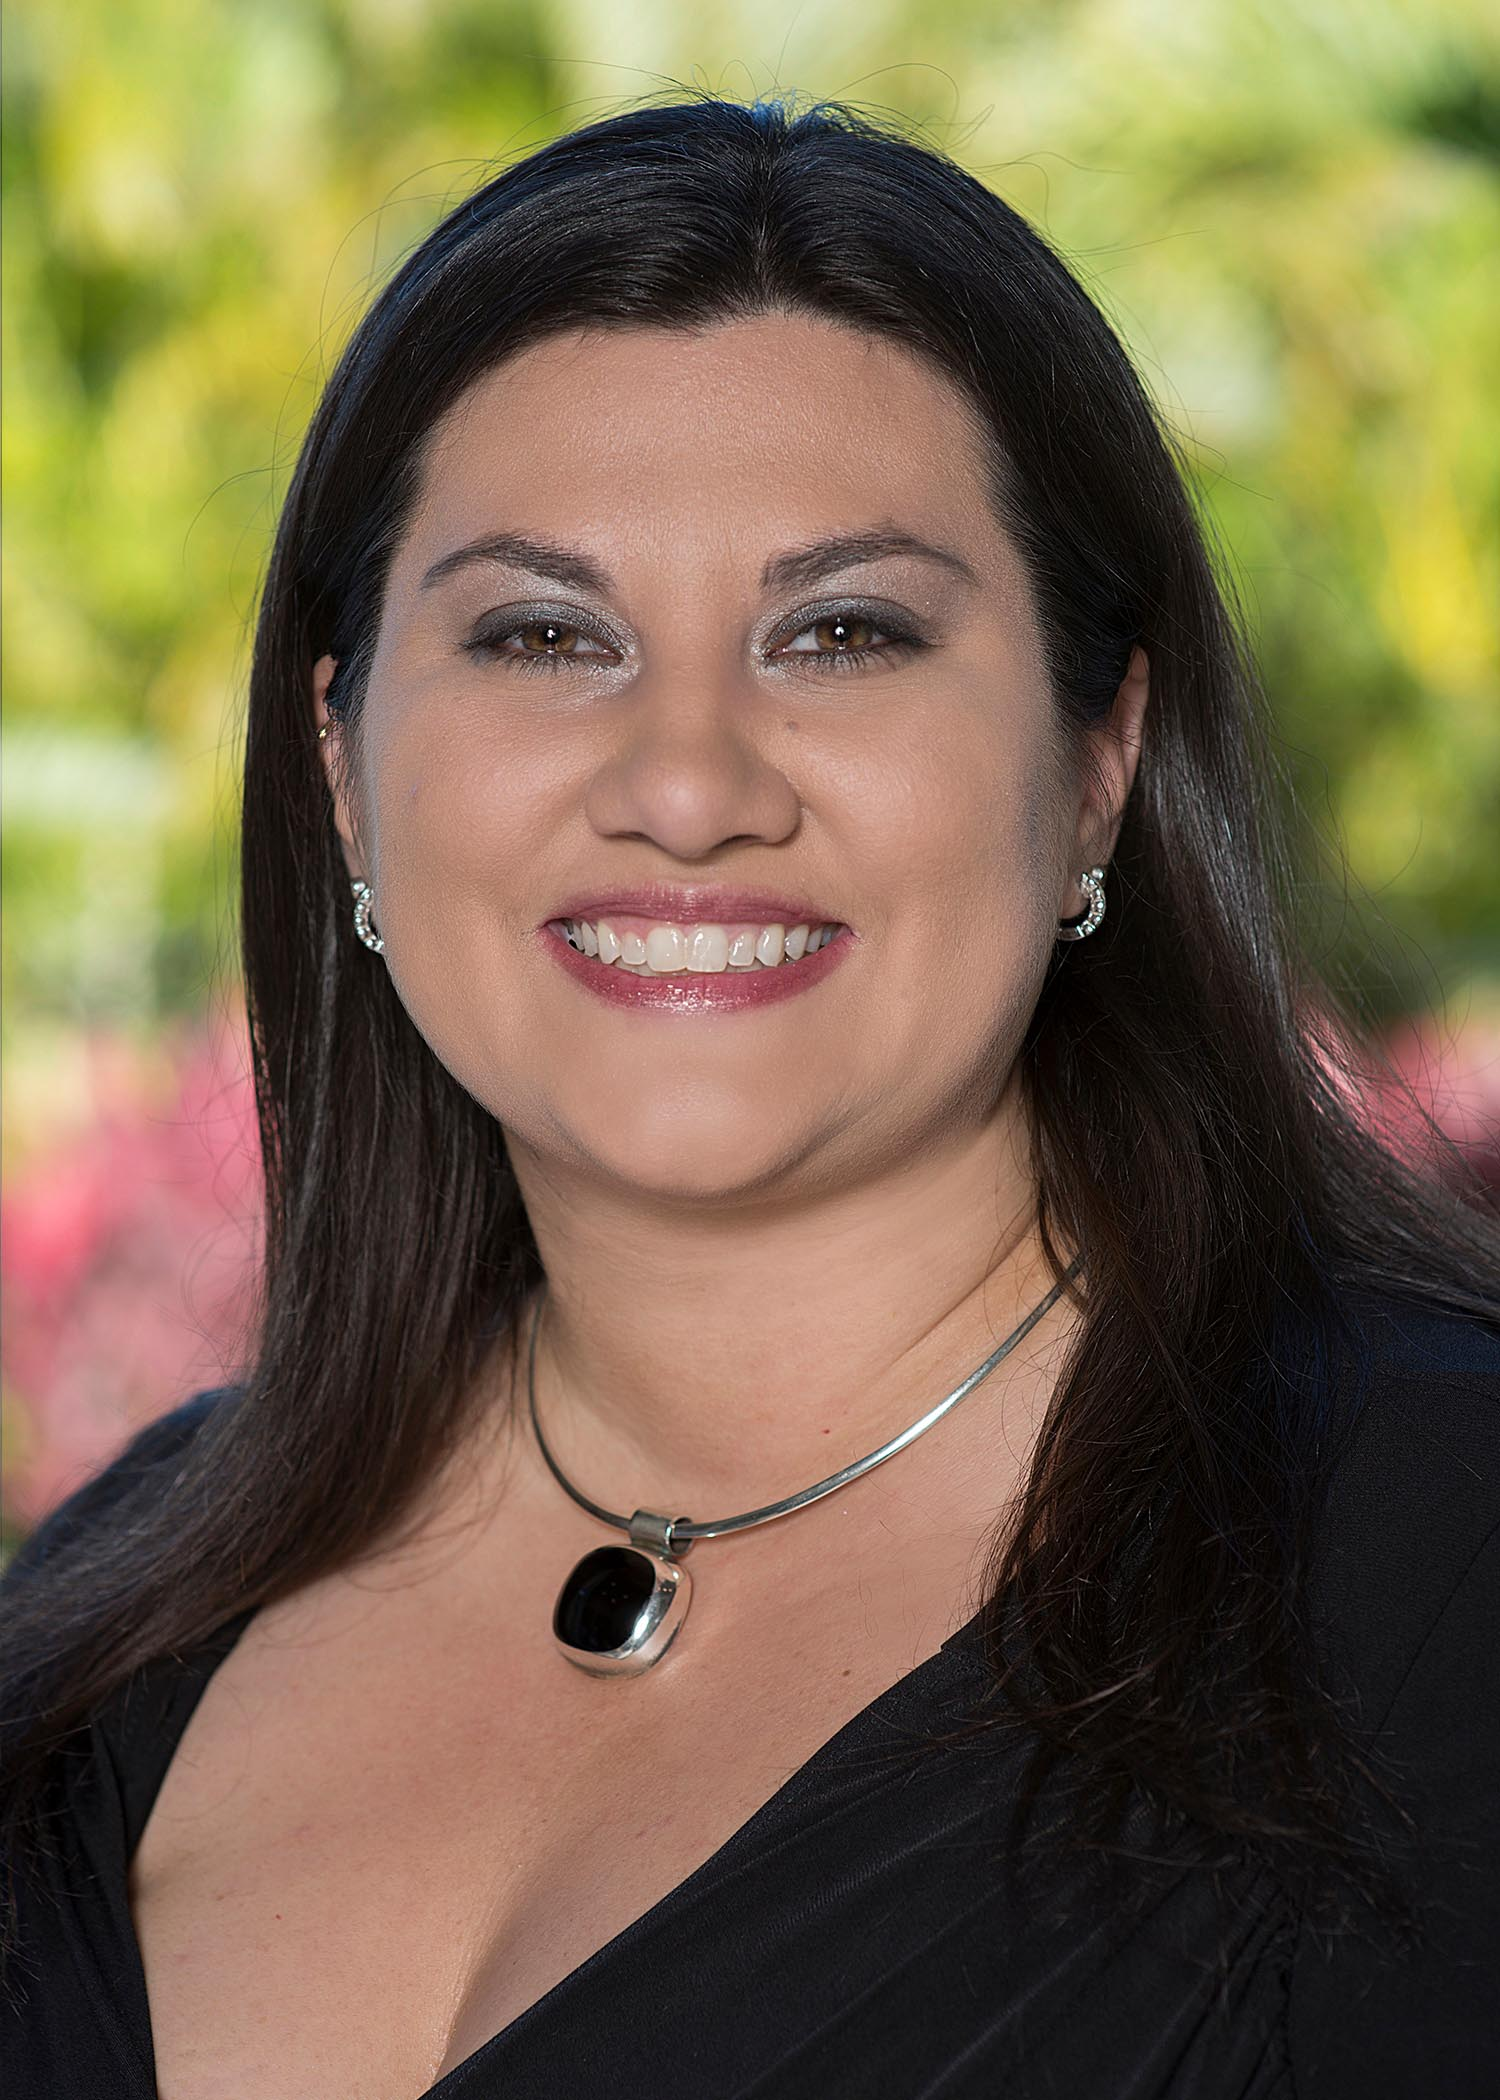 Gisela Knauf | Knauf-Koenig Group - Naples, Florida General Contractor